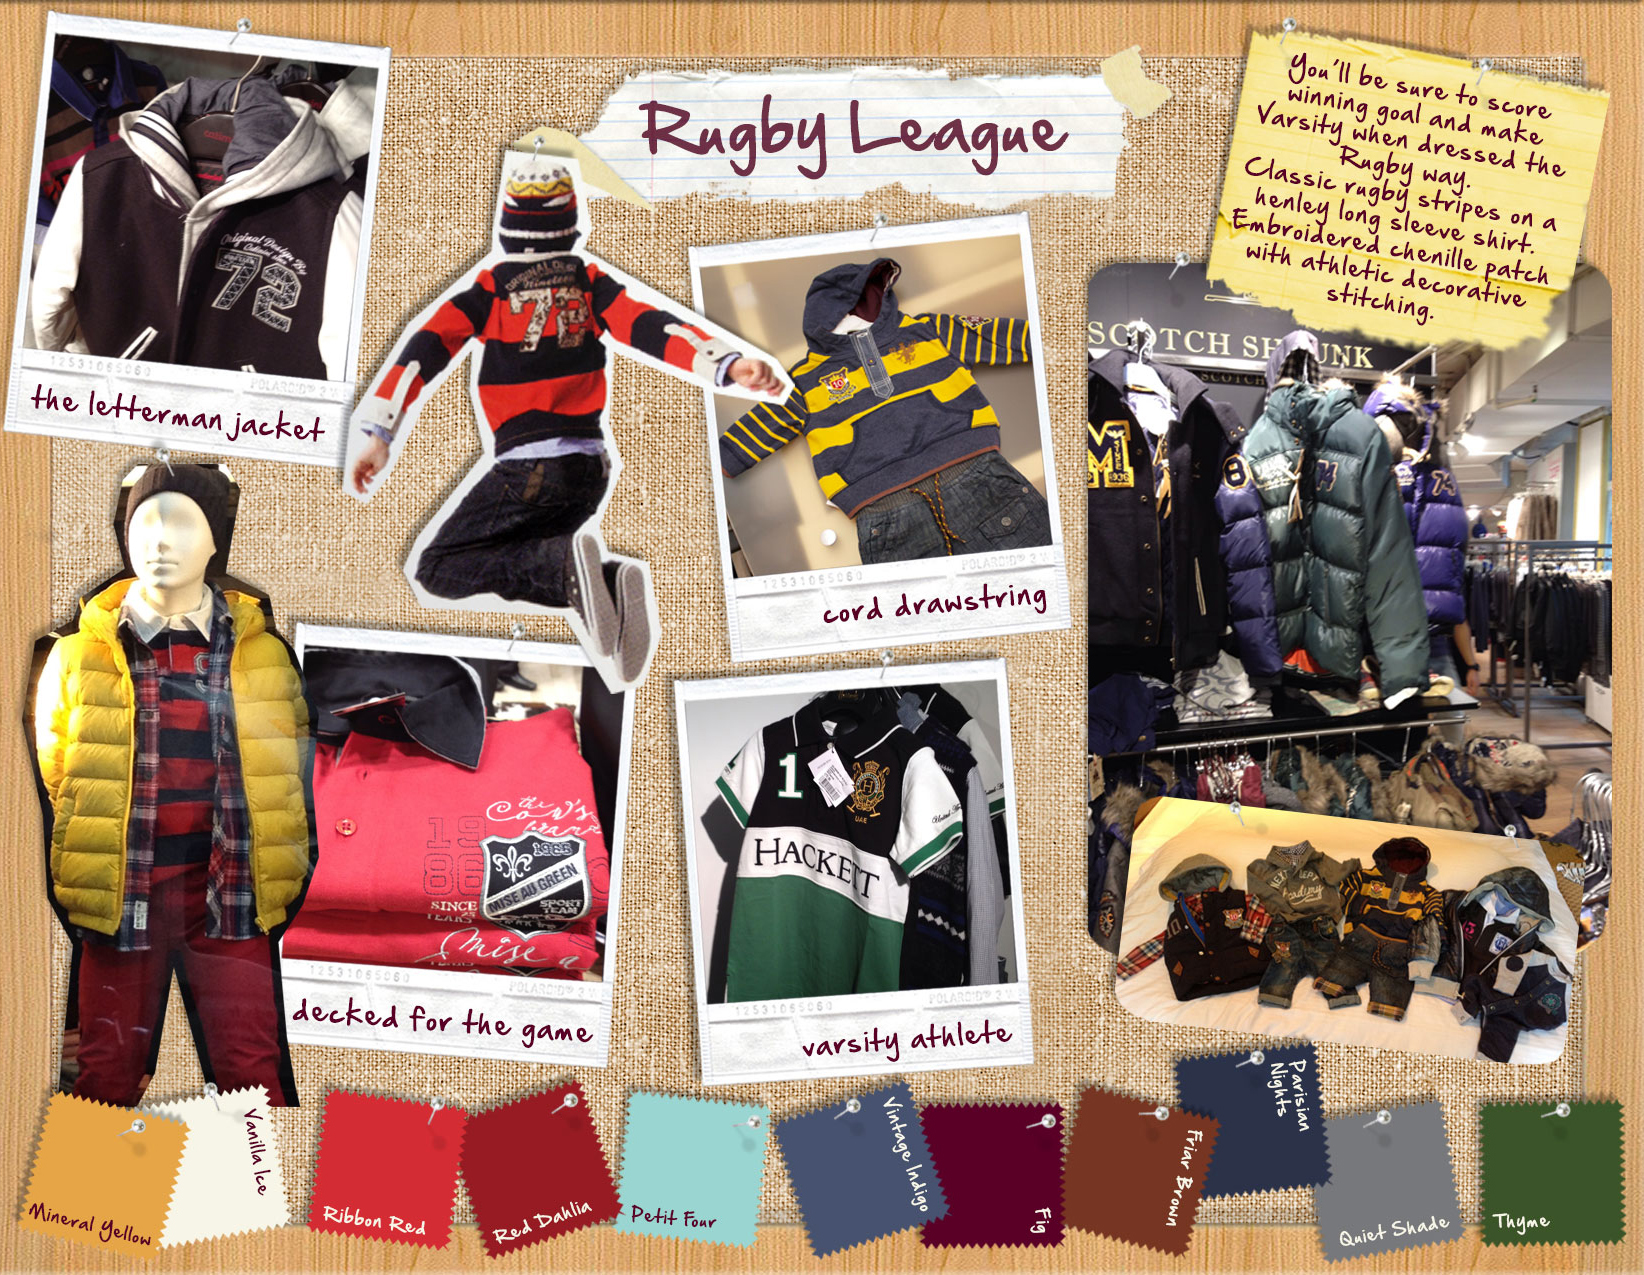 RugbyLeague.jpg